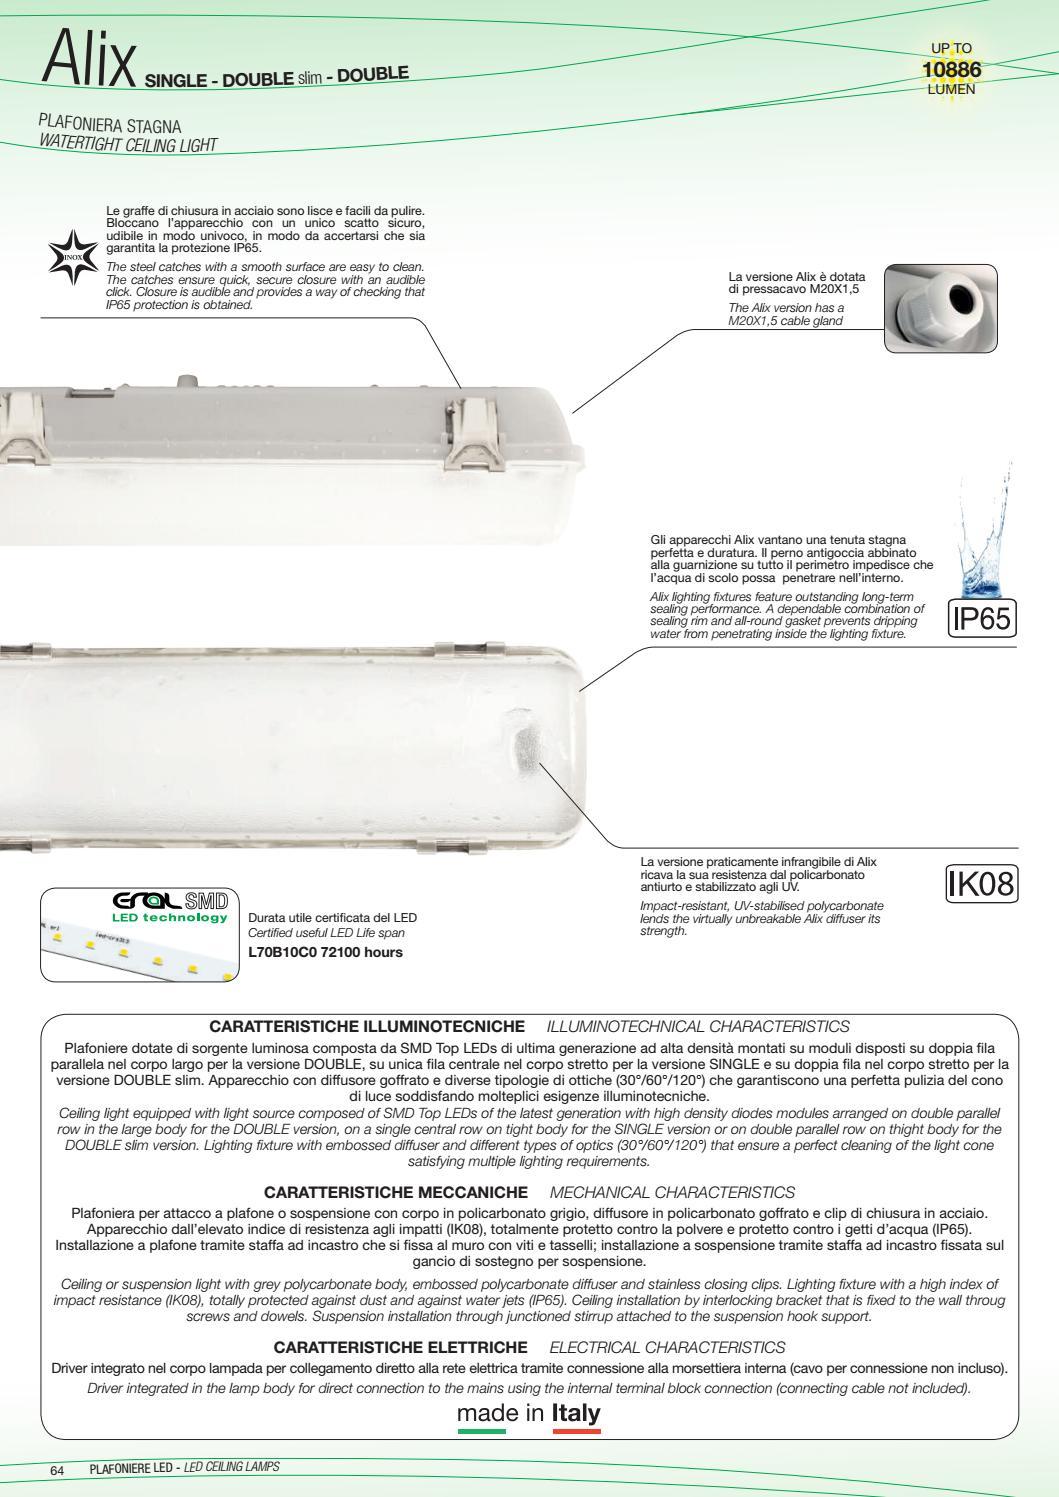 Resistenza LED hook up